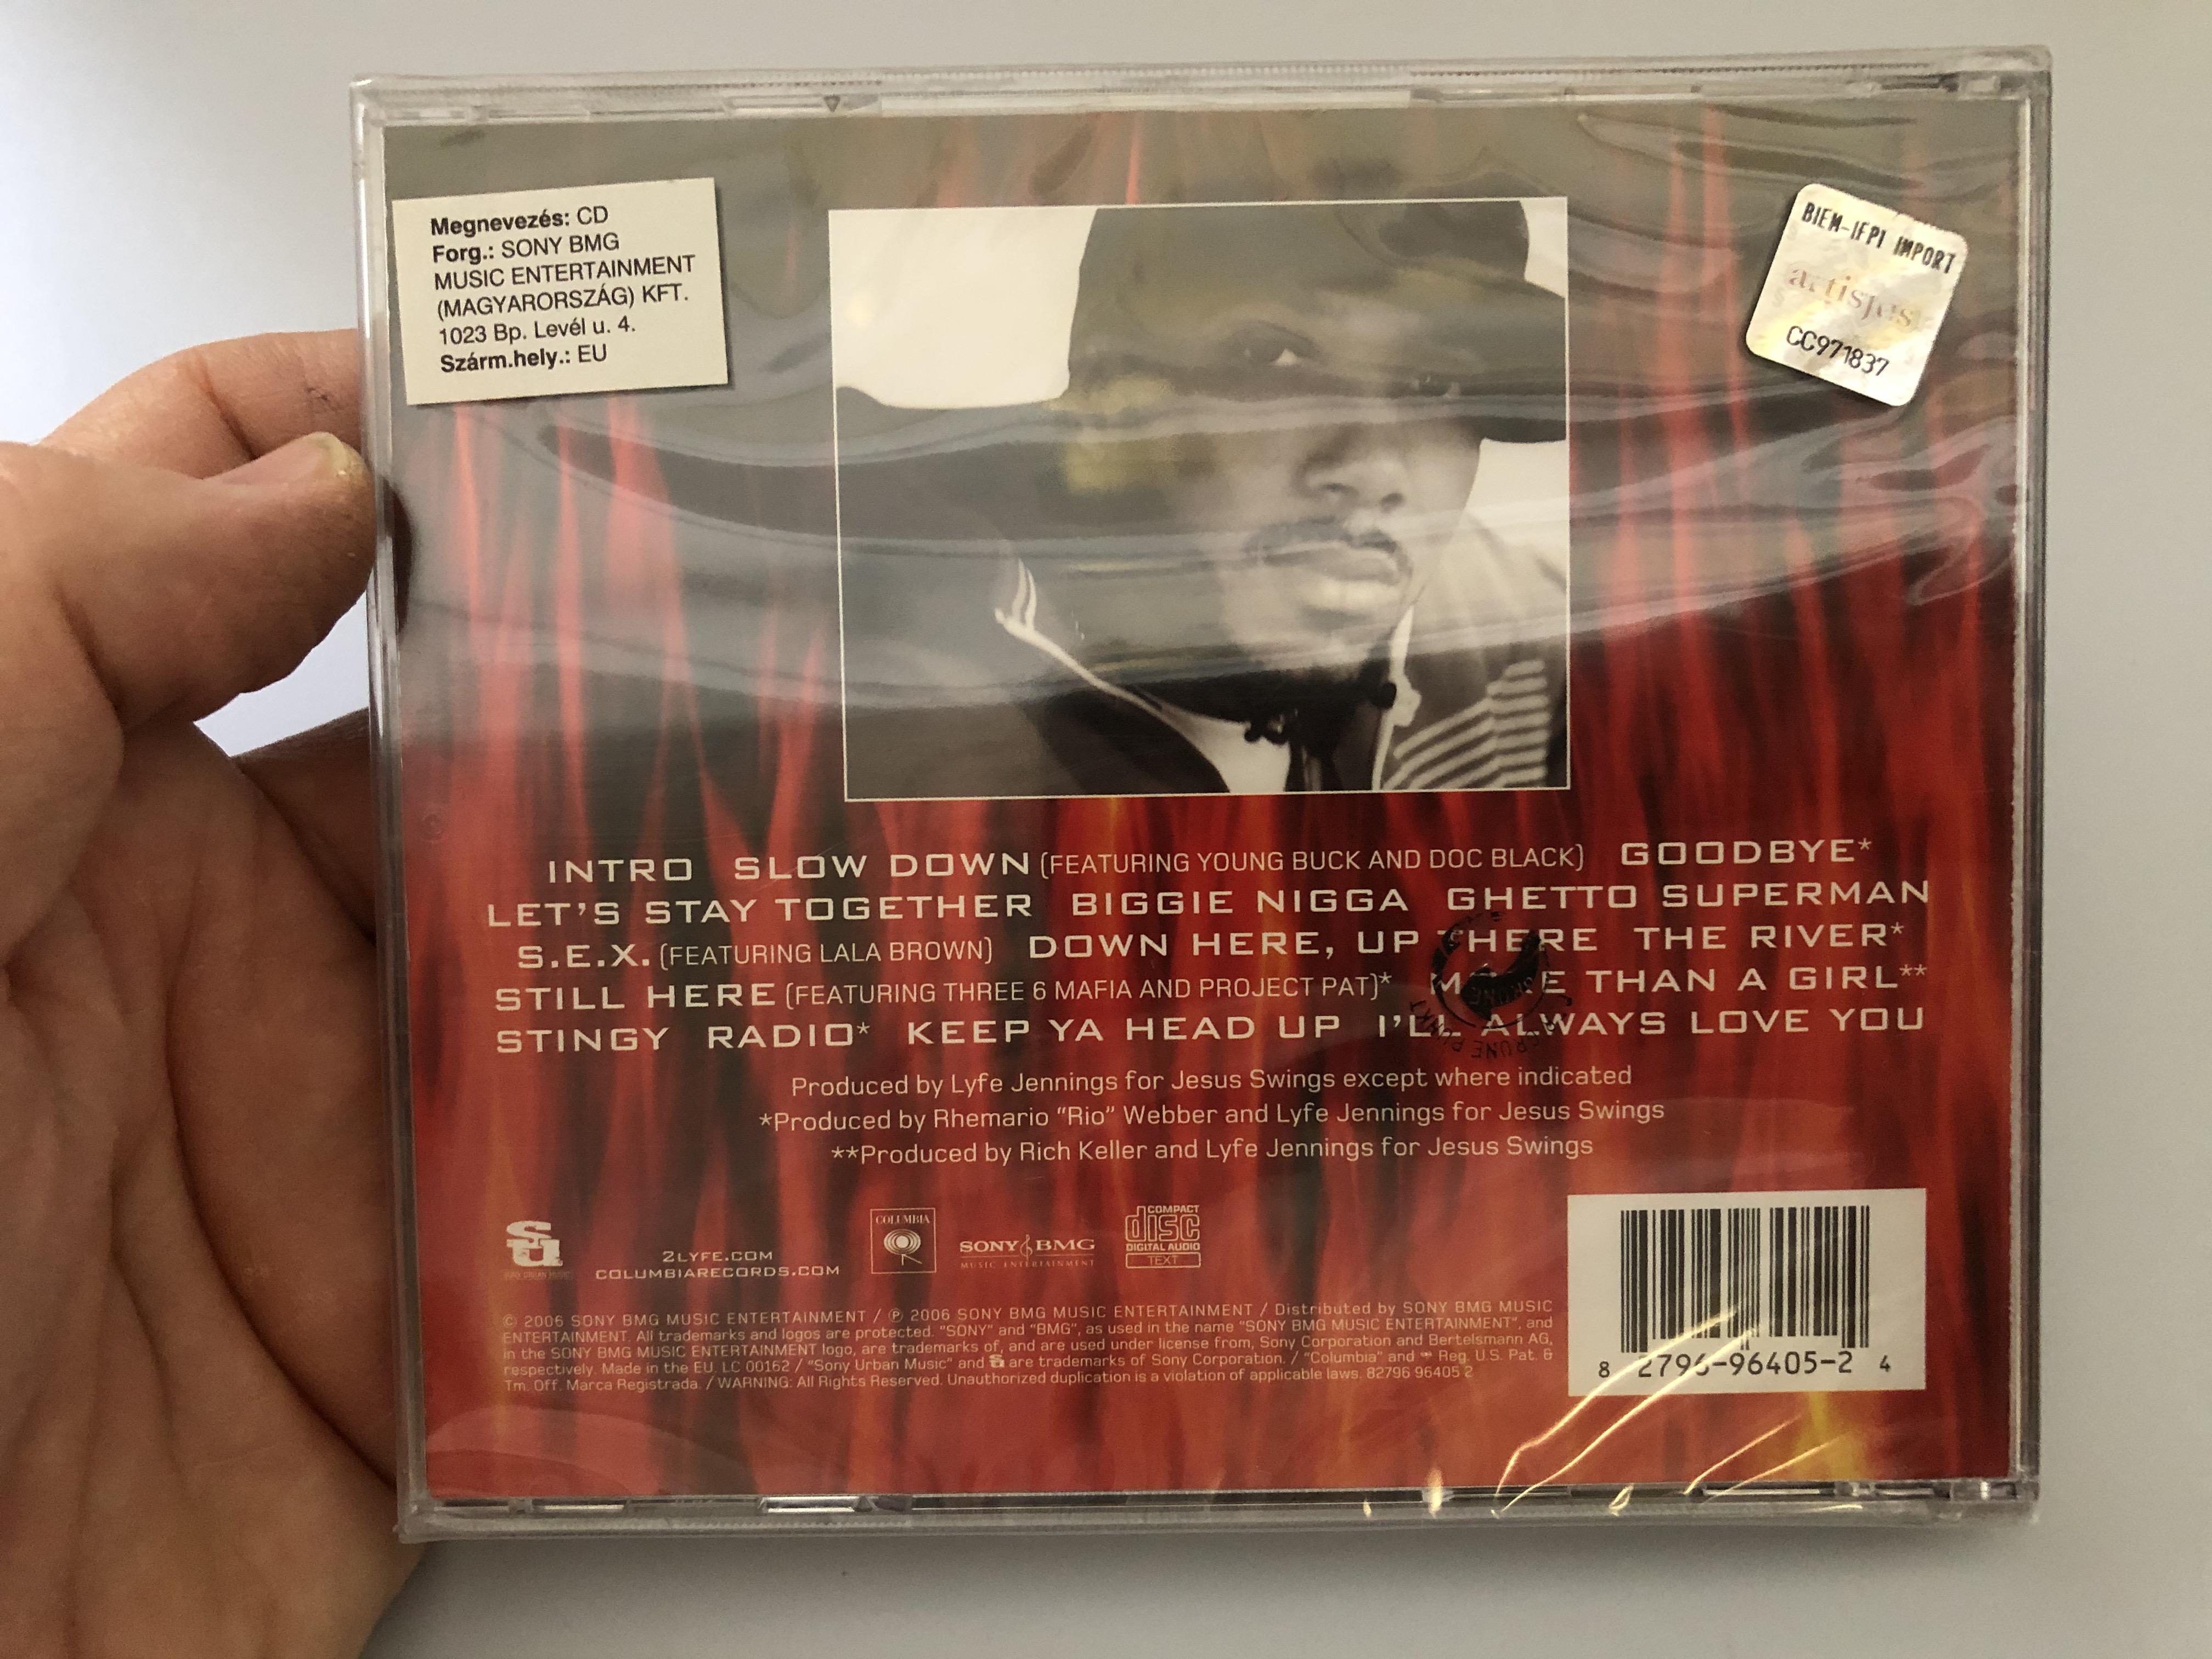 lyfe-jennings-the-phoenix-sony-urban-music-audio-cd-2006-82796-96405-2-2-.jpg